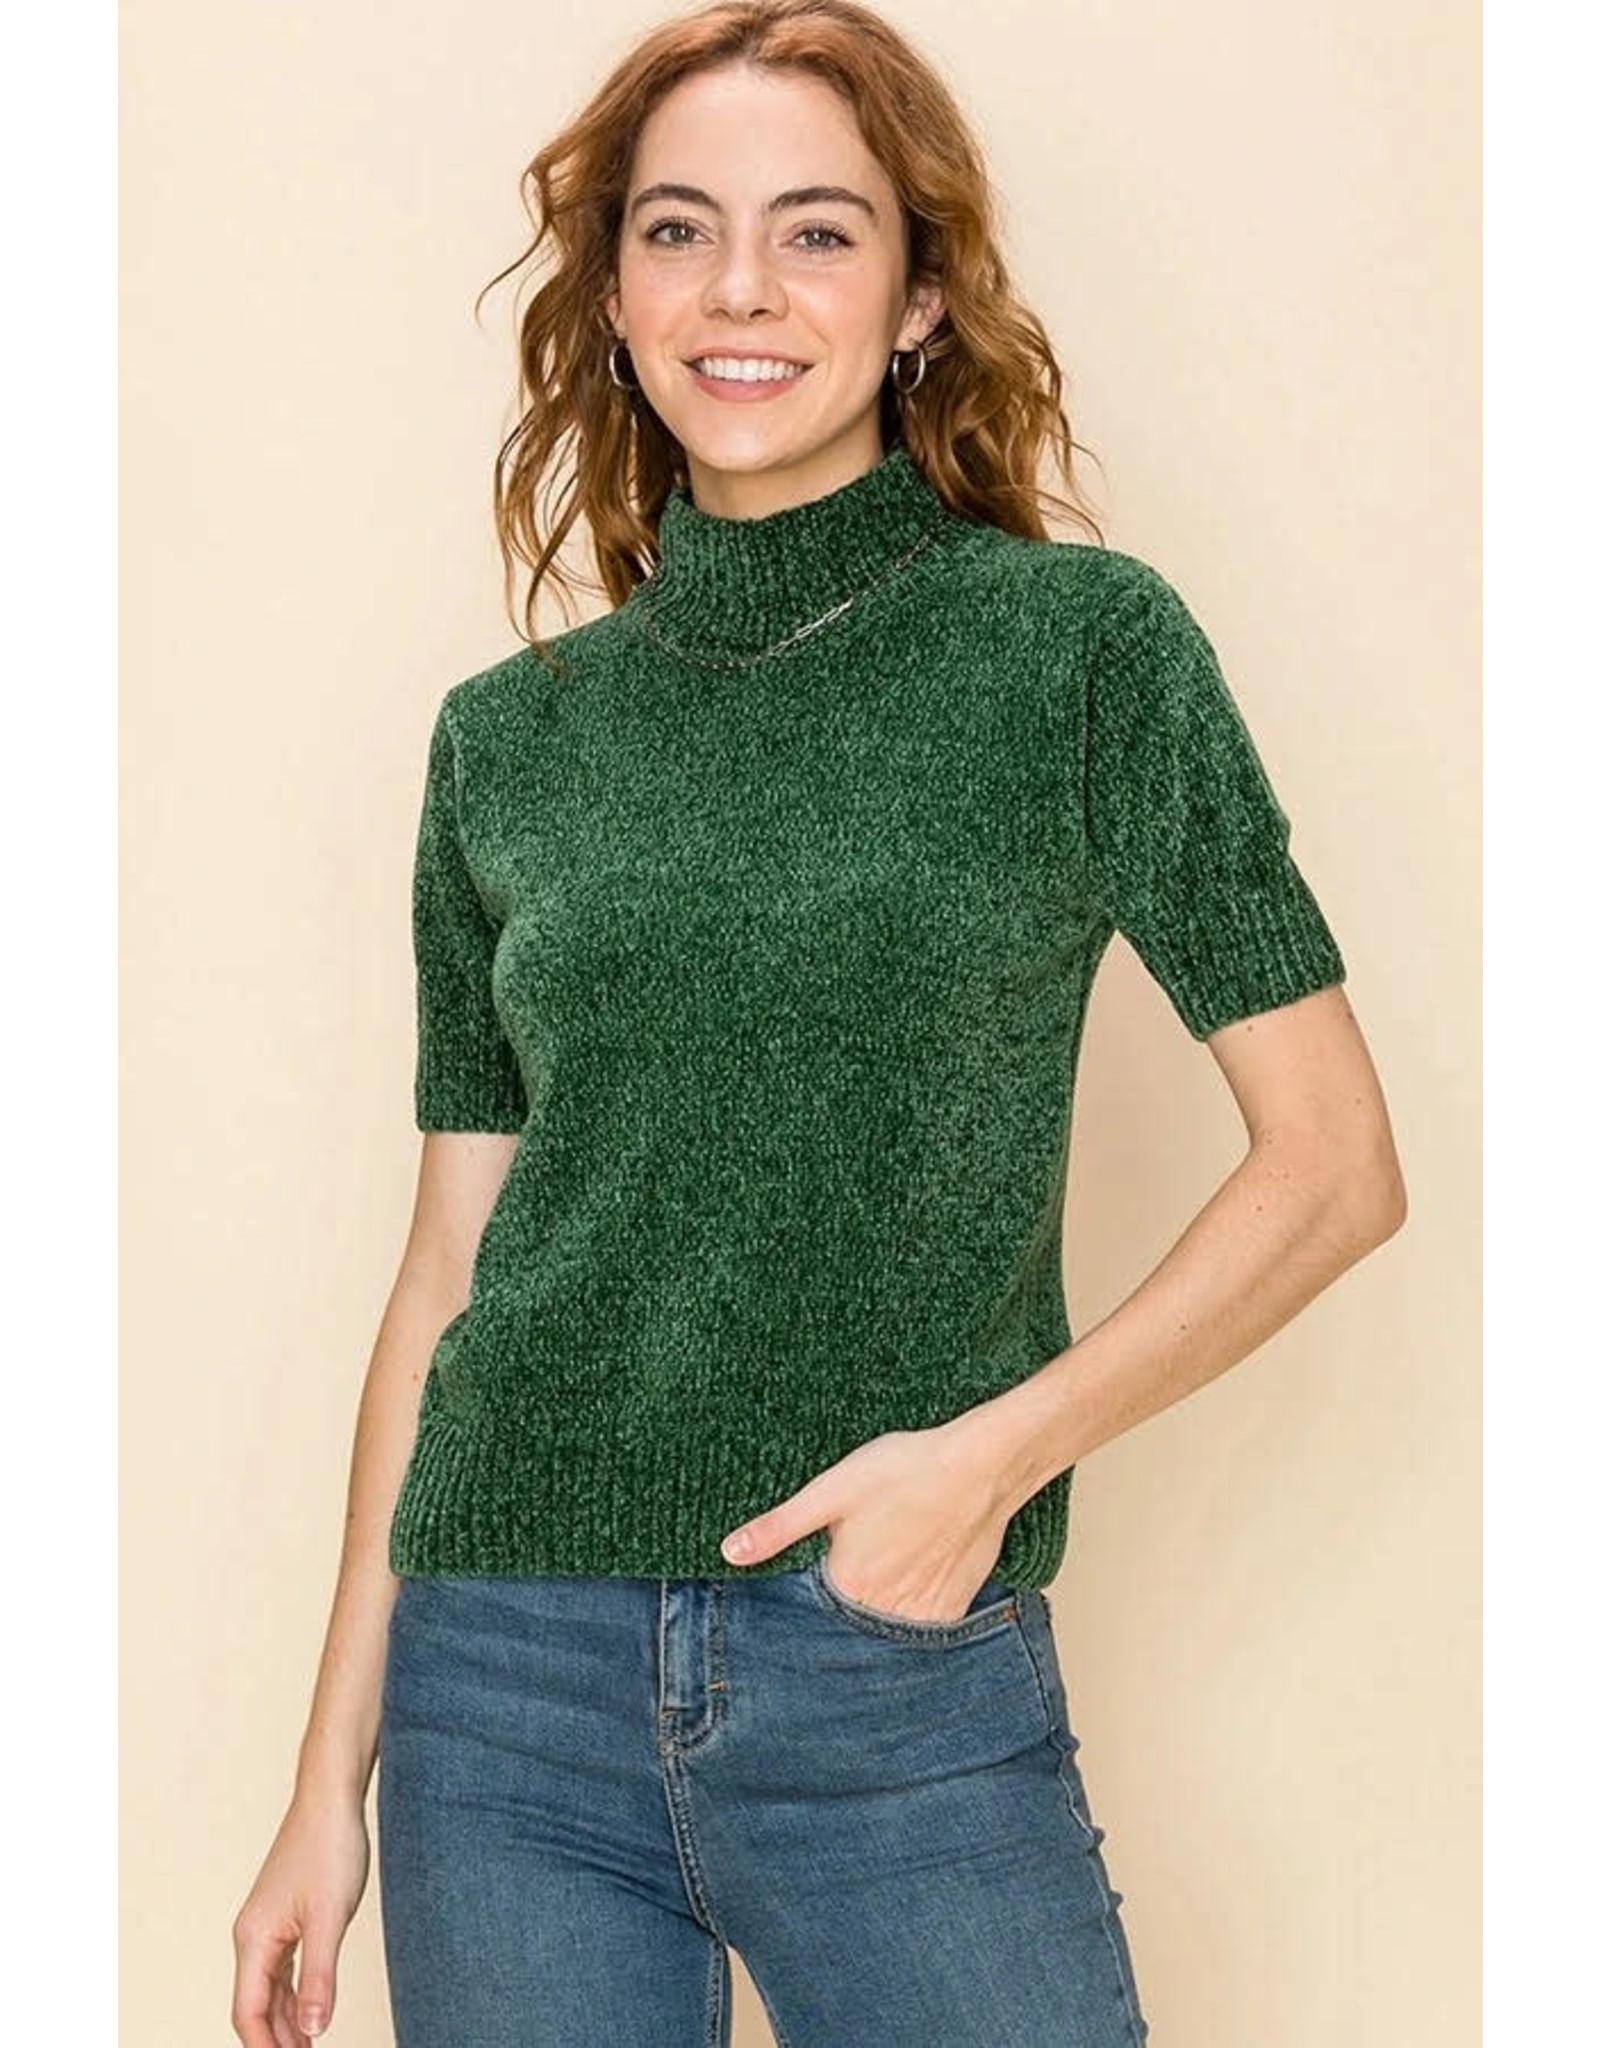 HYFVE JOLLY Short Sleeve Sweater